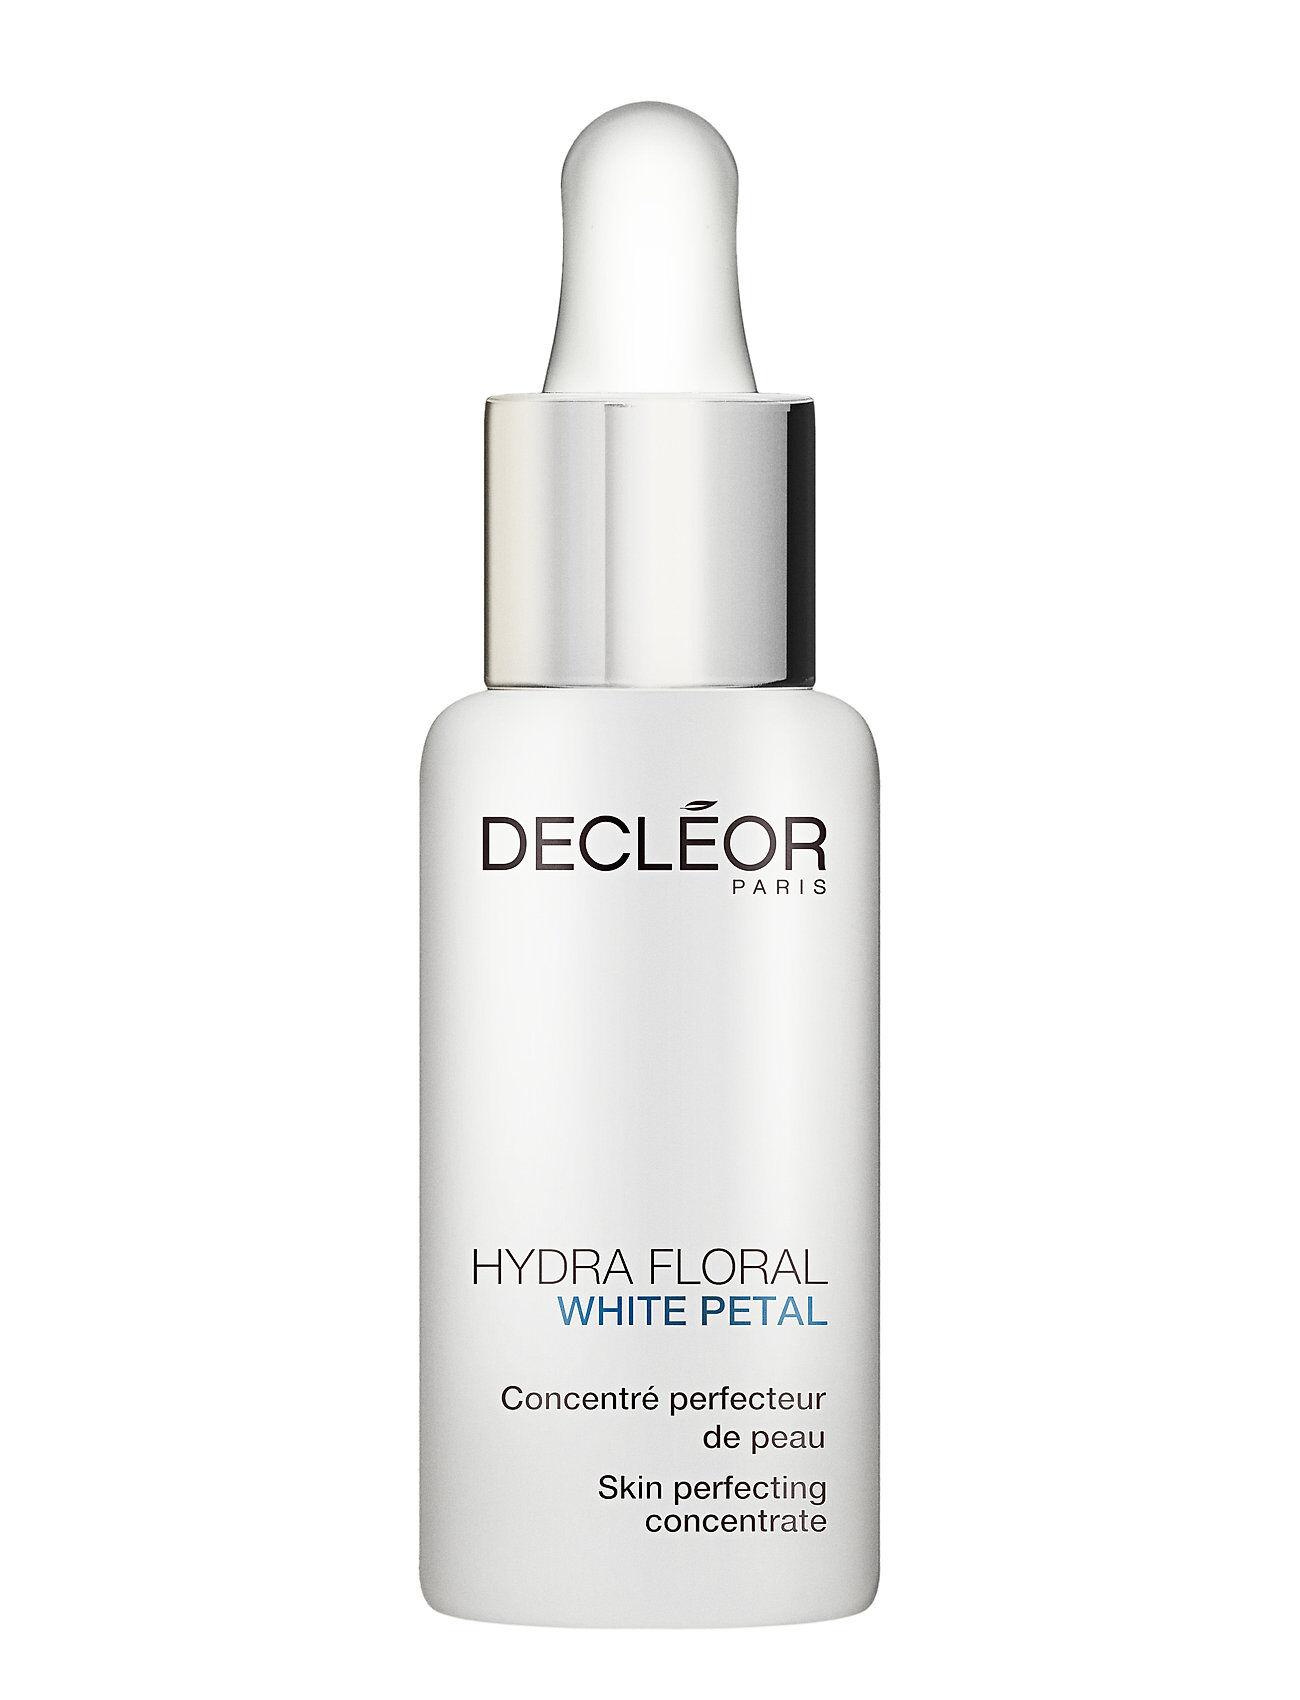 DecléOr Hydra Floral White Petal Perfecting Concentrate Seerumi Kasvot Ihonhoito Nude Decléor